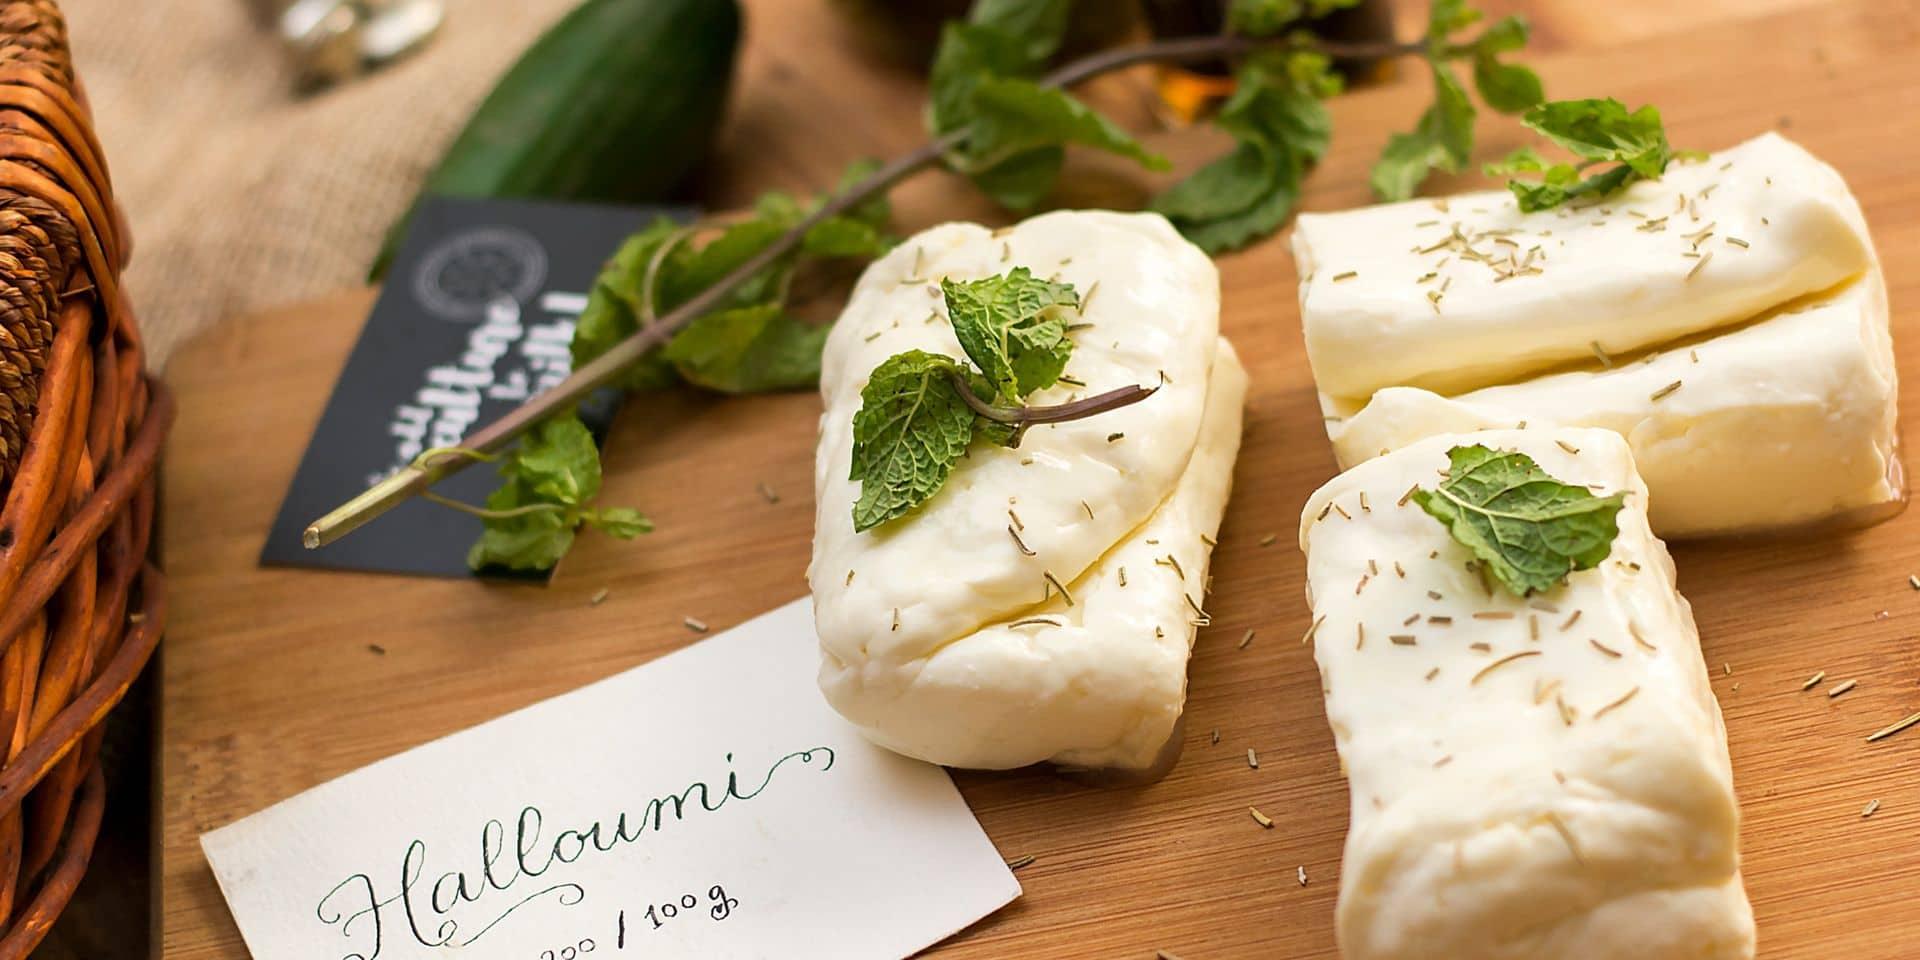 Halloumi,Cheese,-,Food,Photography